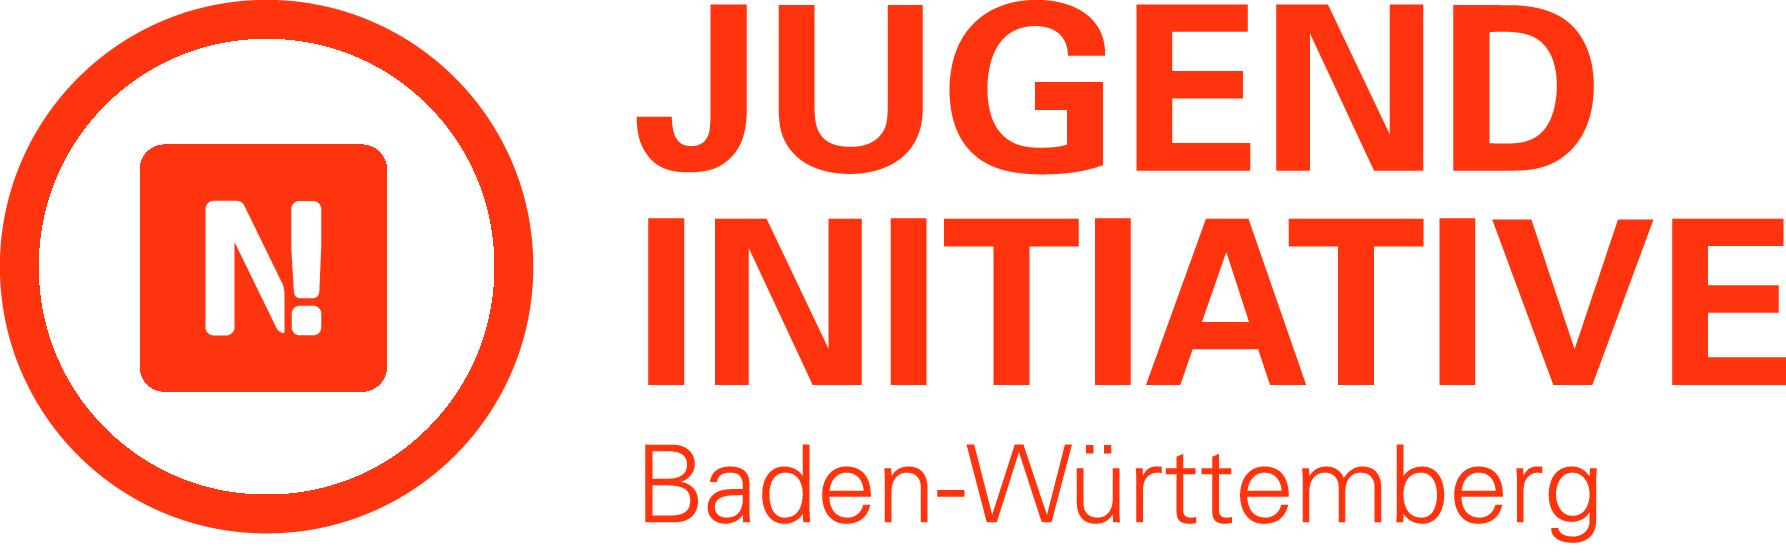 Logo_Jugendinitiative_rundes_n[5040].jpg